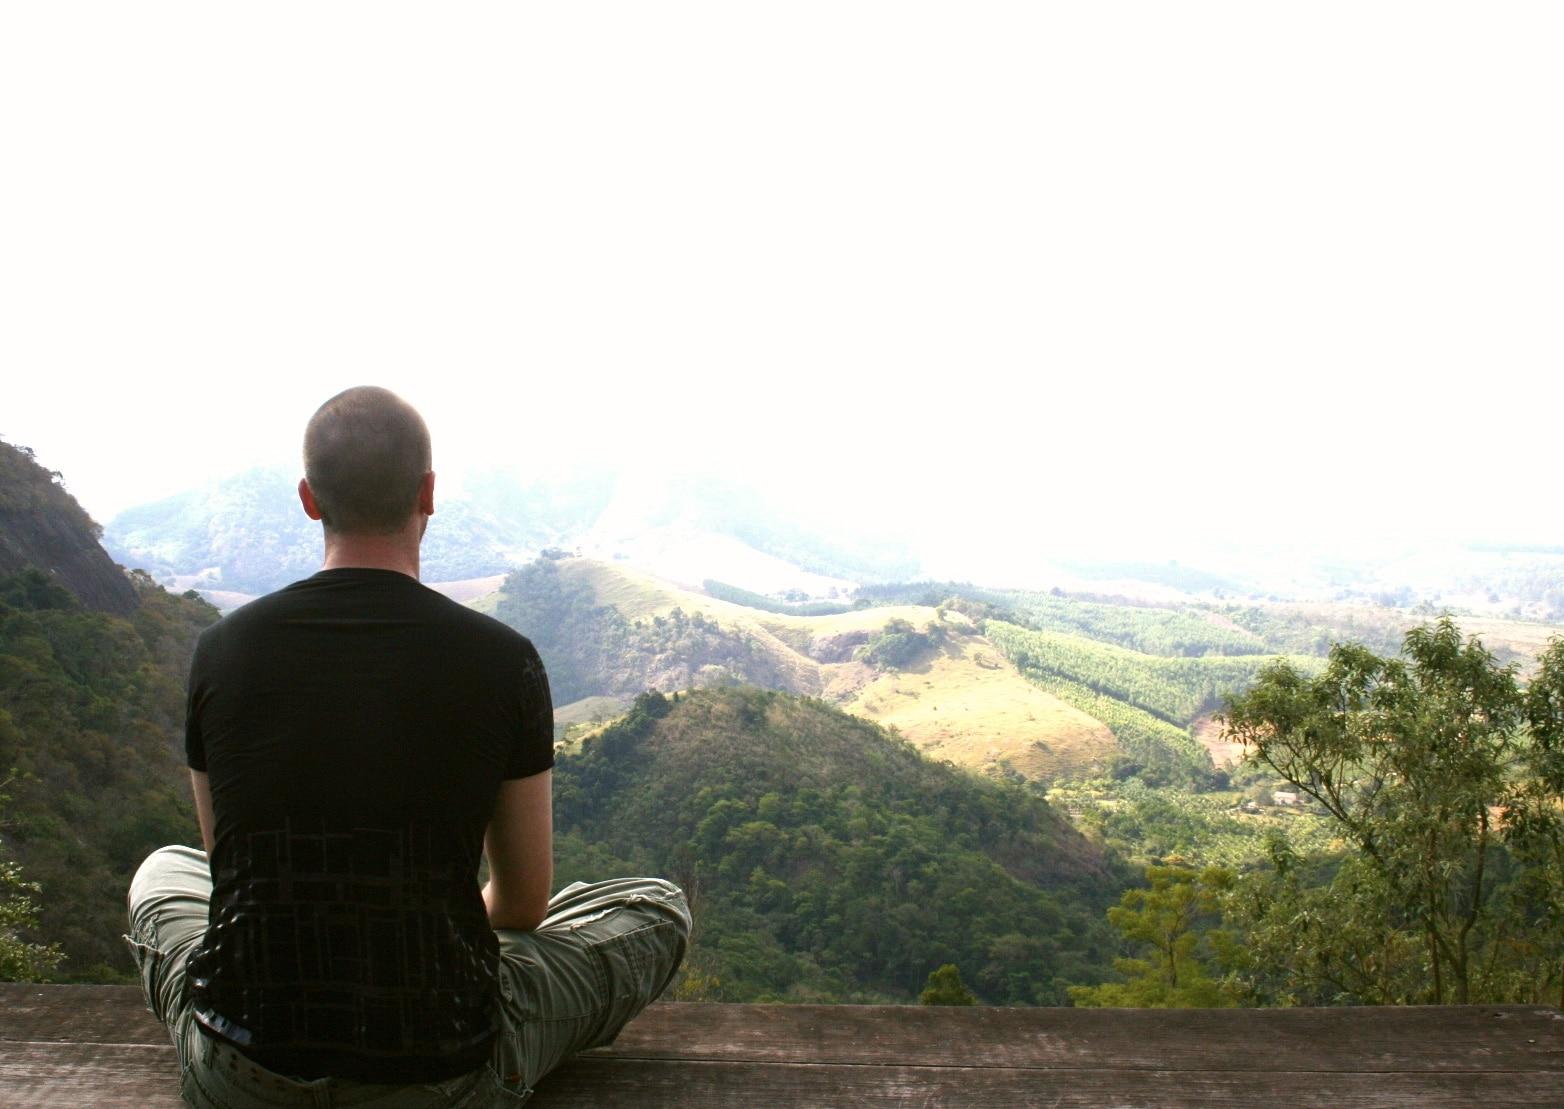 Méditation en plein air